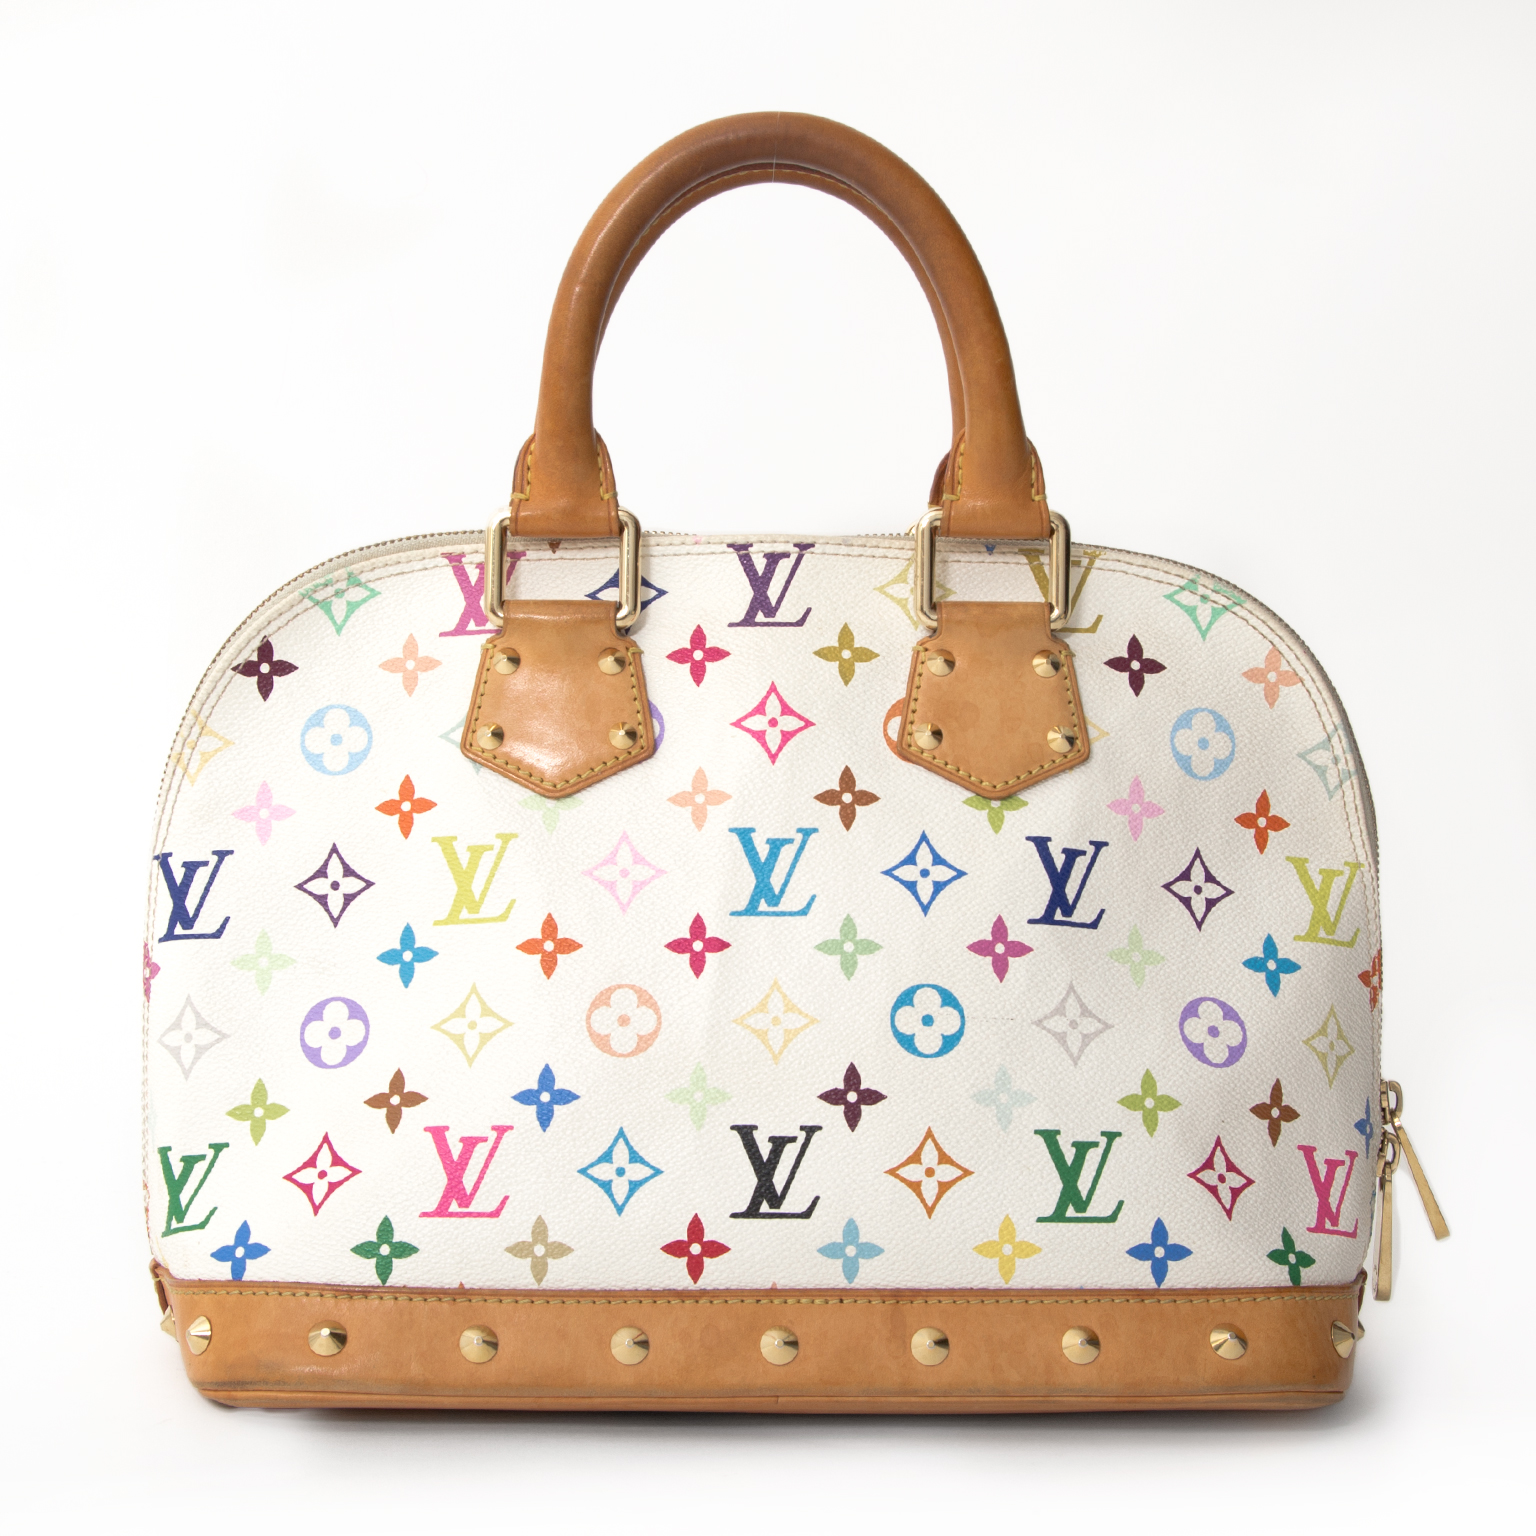 4a9207933e44 ... Louis Vuitton Murakami Multicolore Monogram White Alma shop buy sell  resell